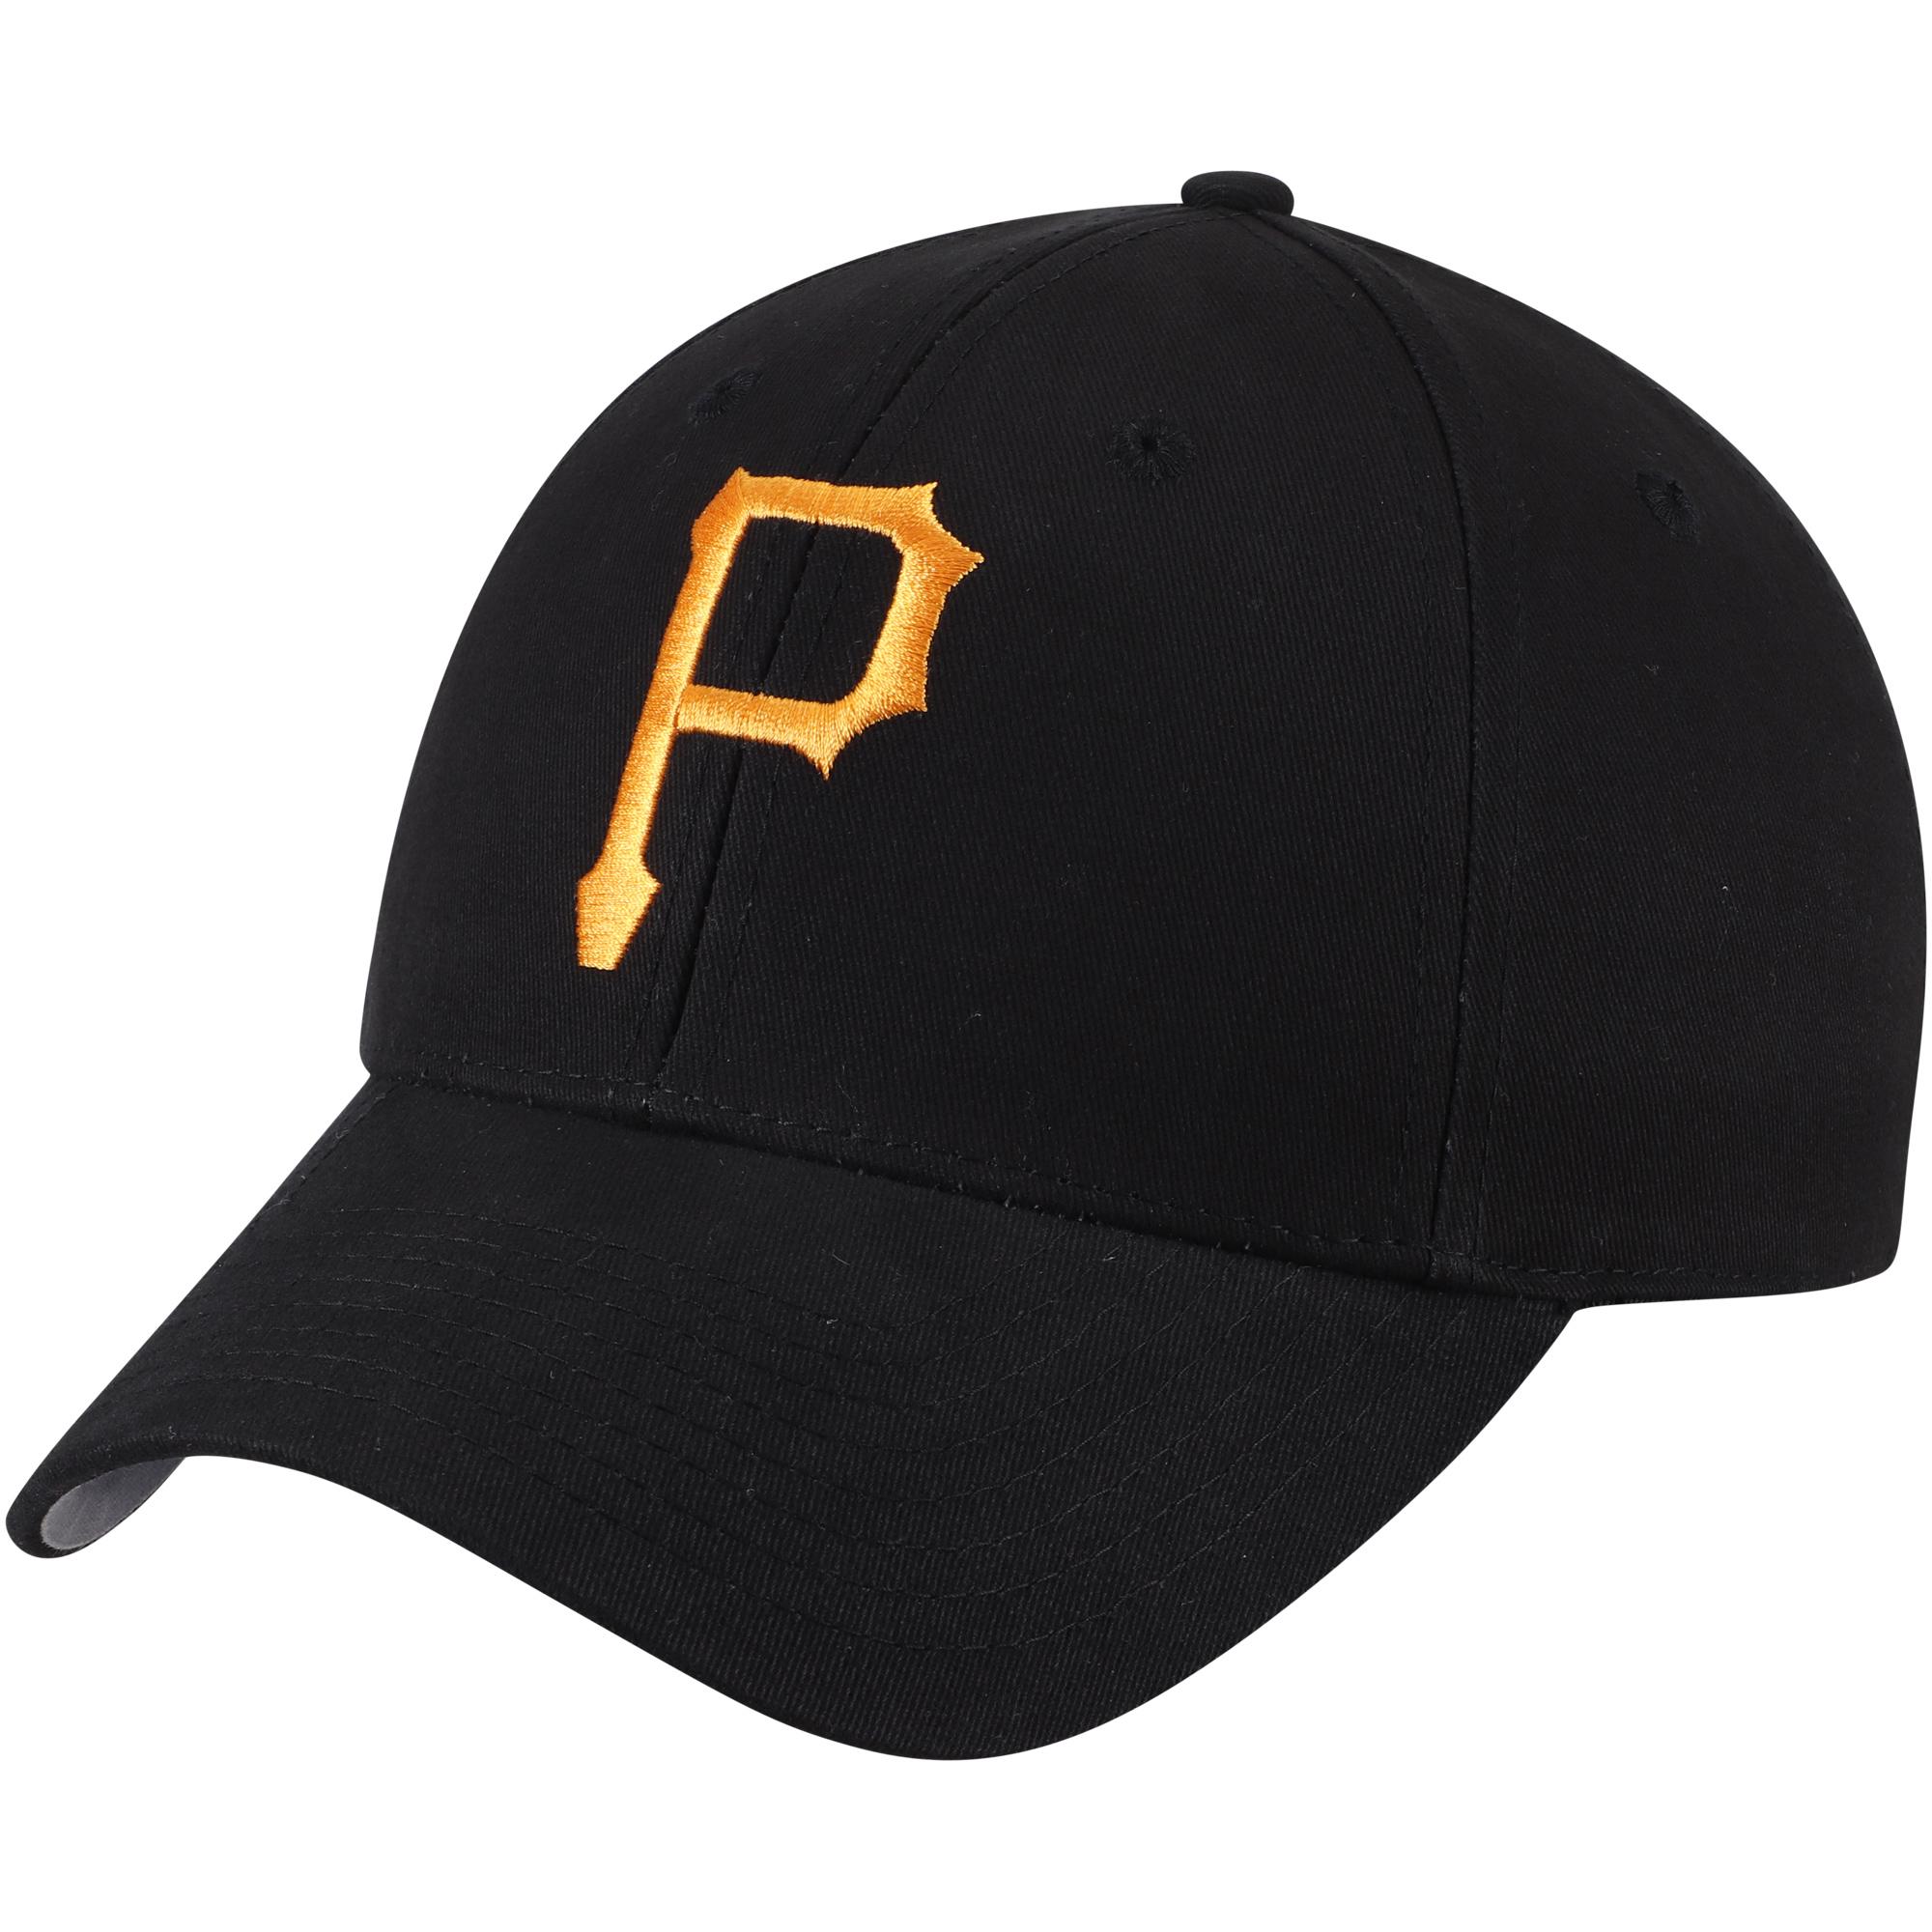 Fan Favorite Pittsburgh Pirates '47 Basic Adjustable Hat - Black - OSFA